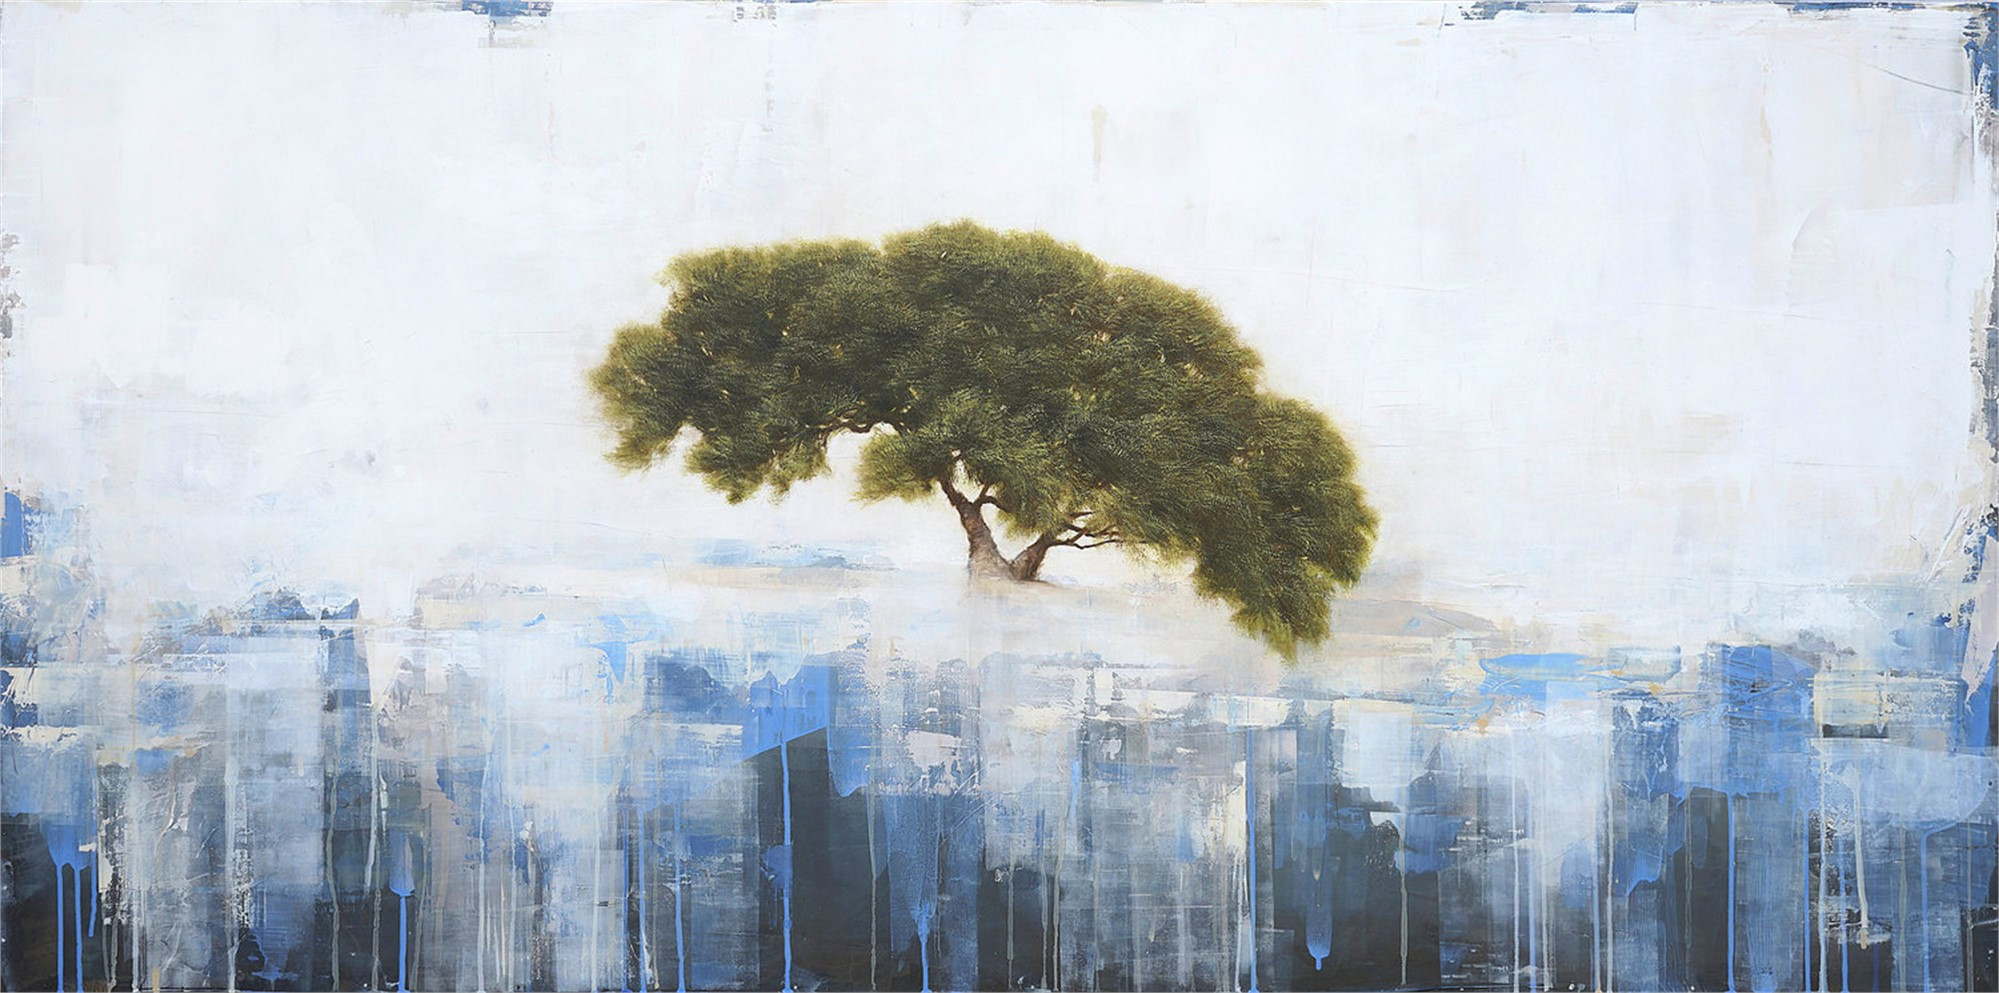 La Verita by Jessica Pisano